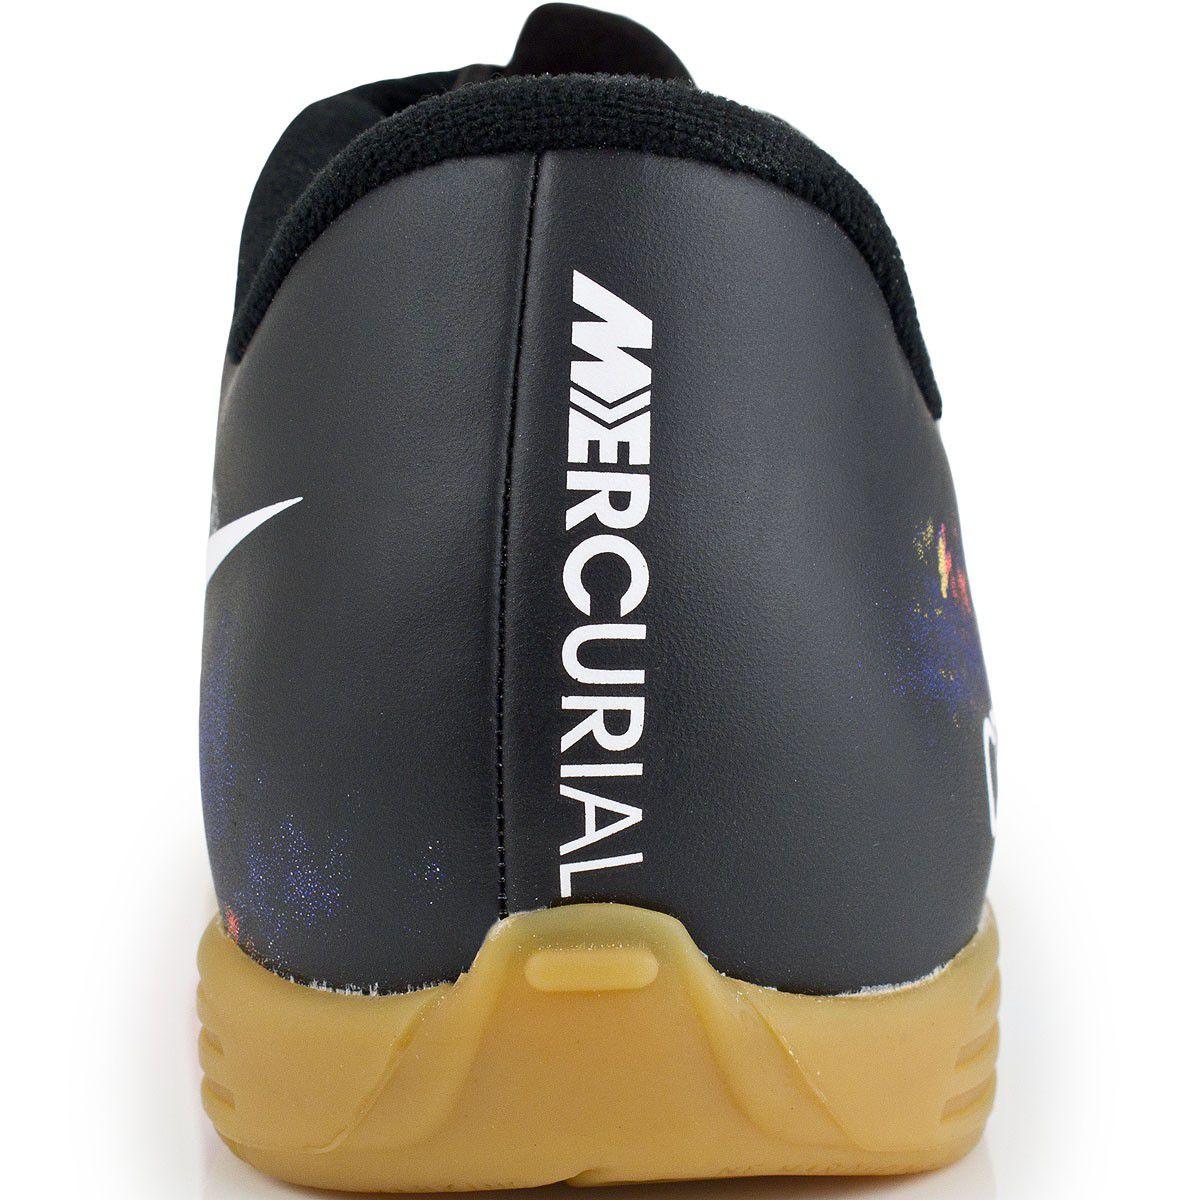 e0335a27fa6 ... Chuteira Nike Mercurial Vortex II CR Futsal Infantil - Sportland ...